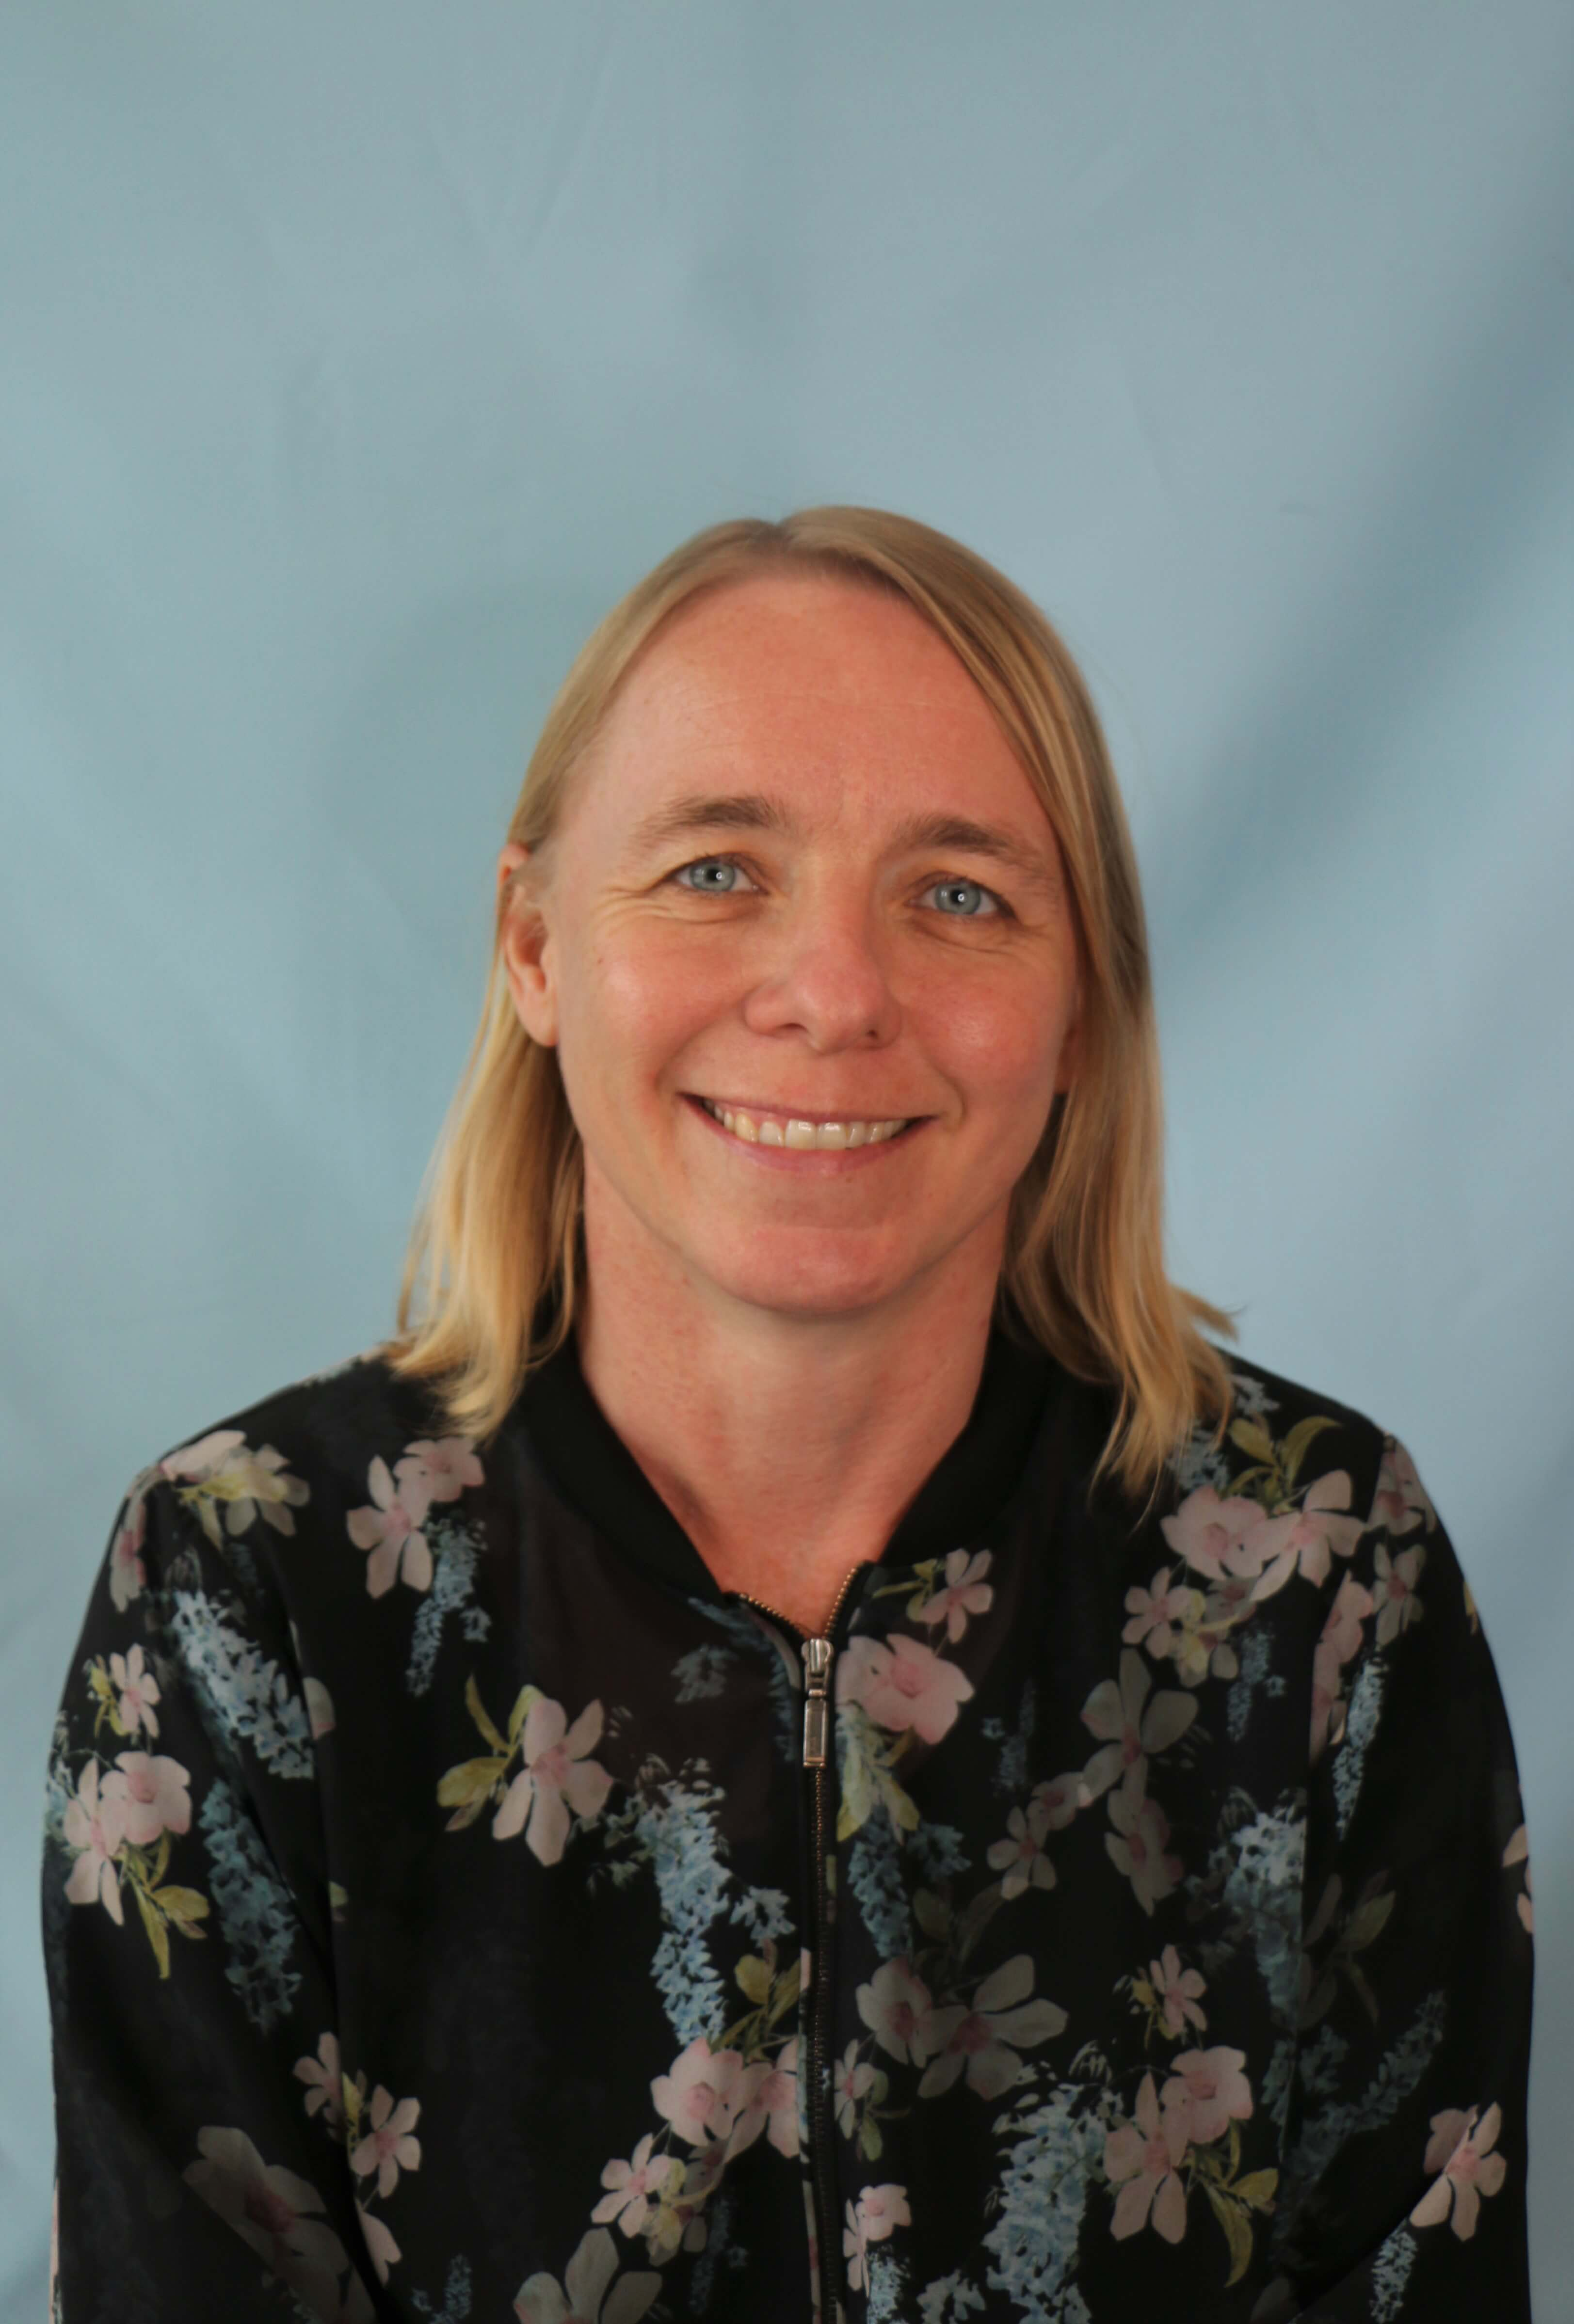 Avonside Girls High School Deputy Principal